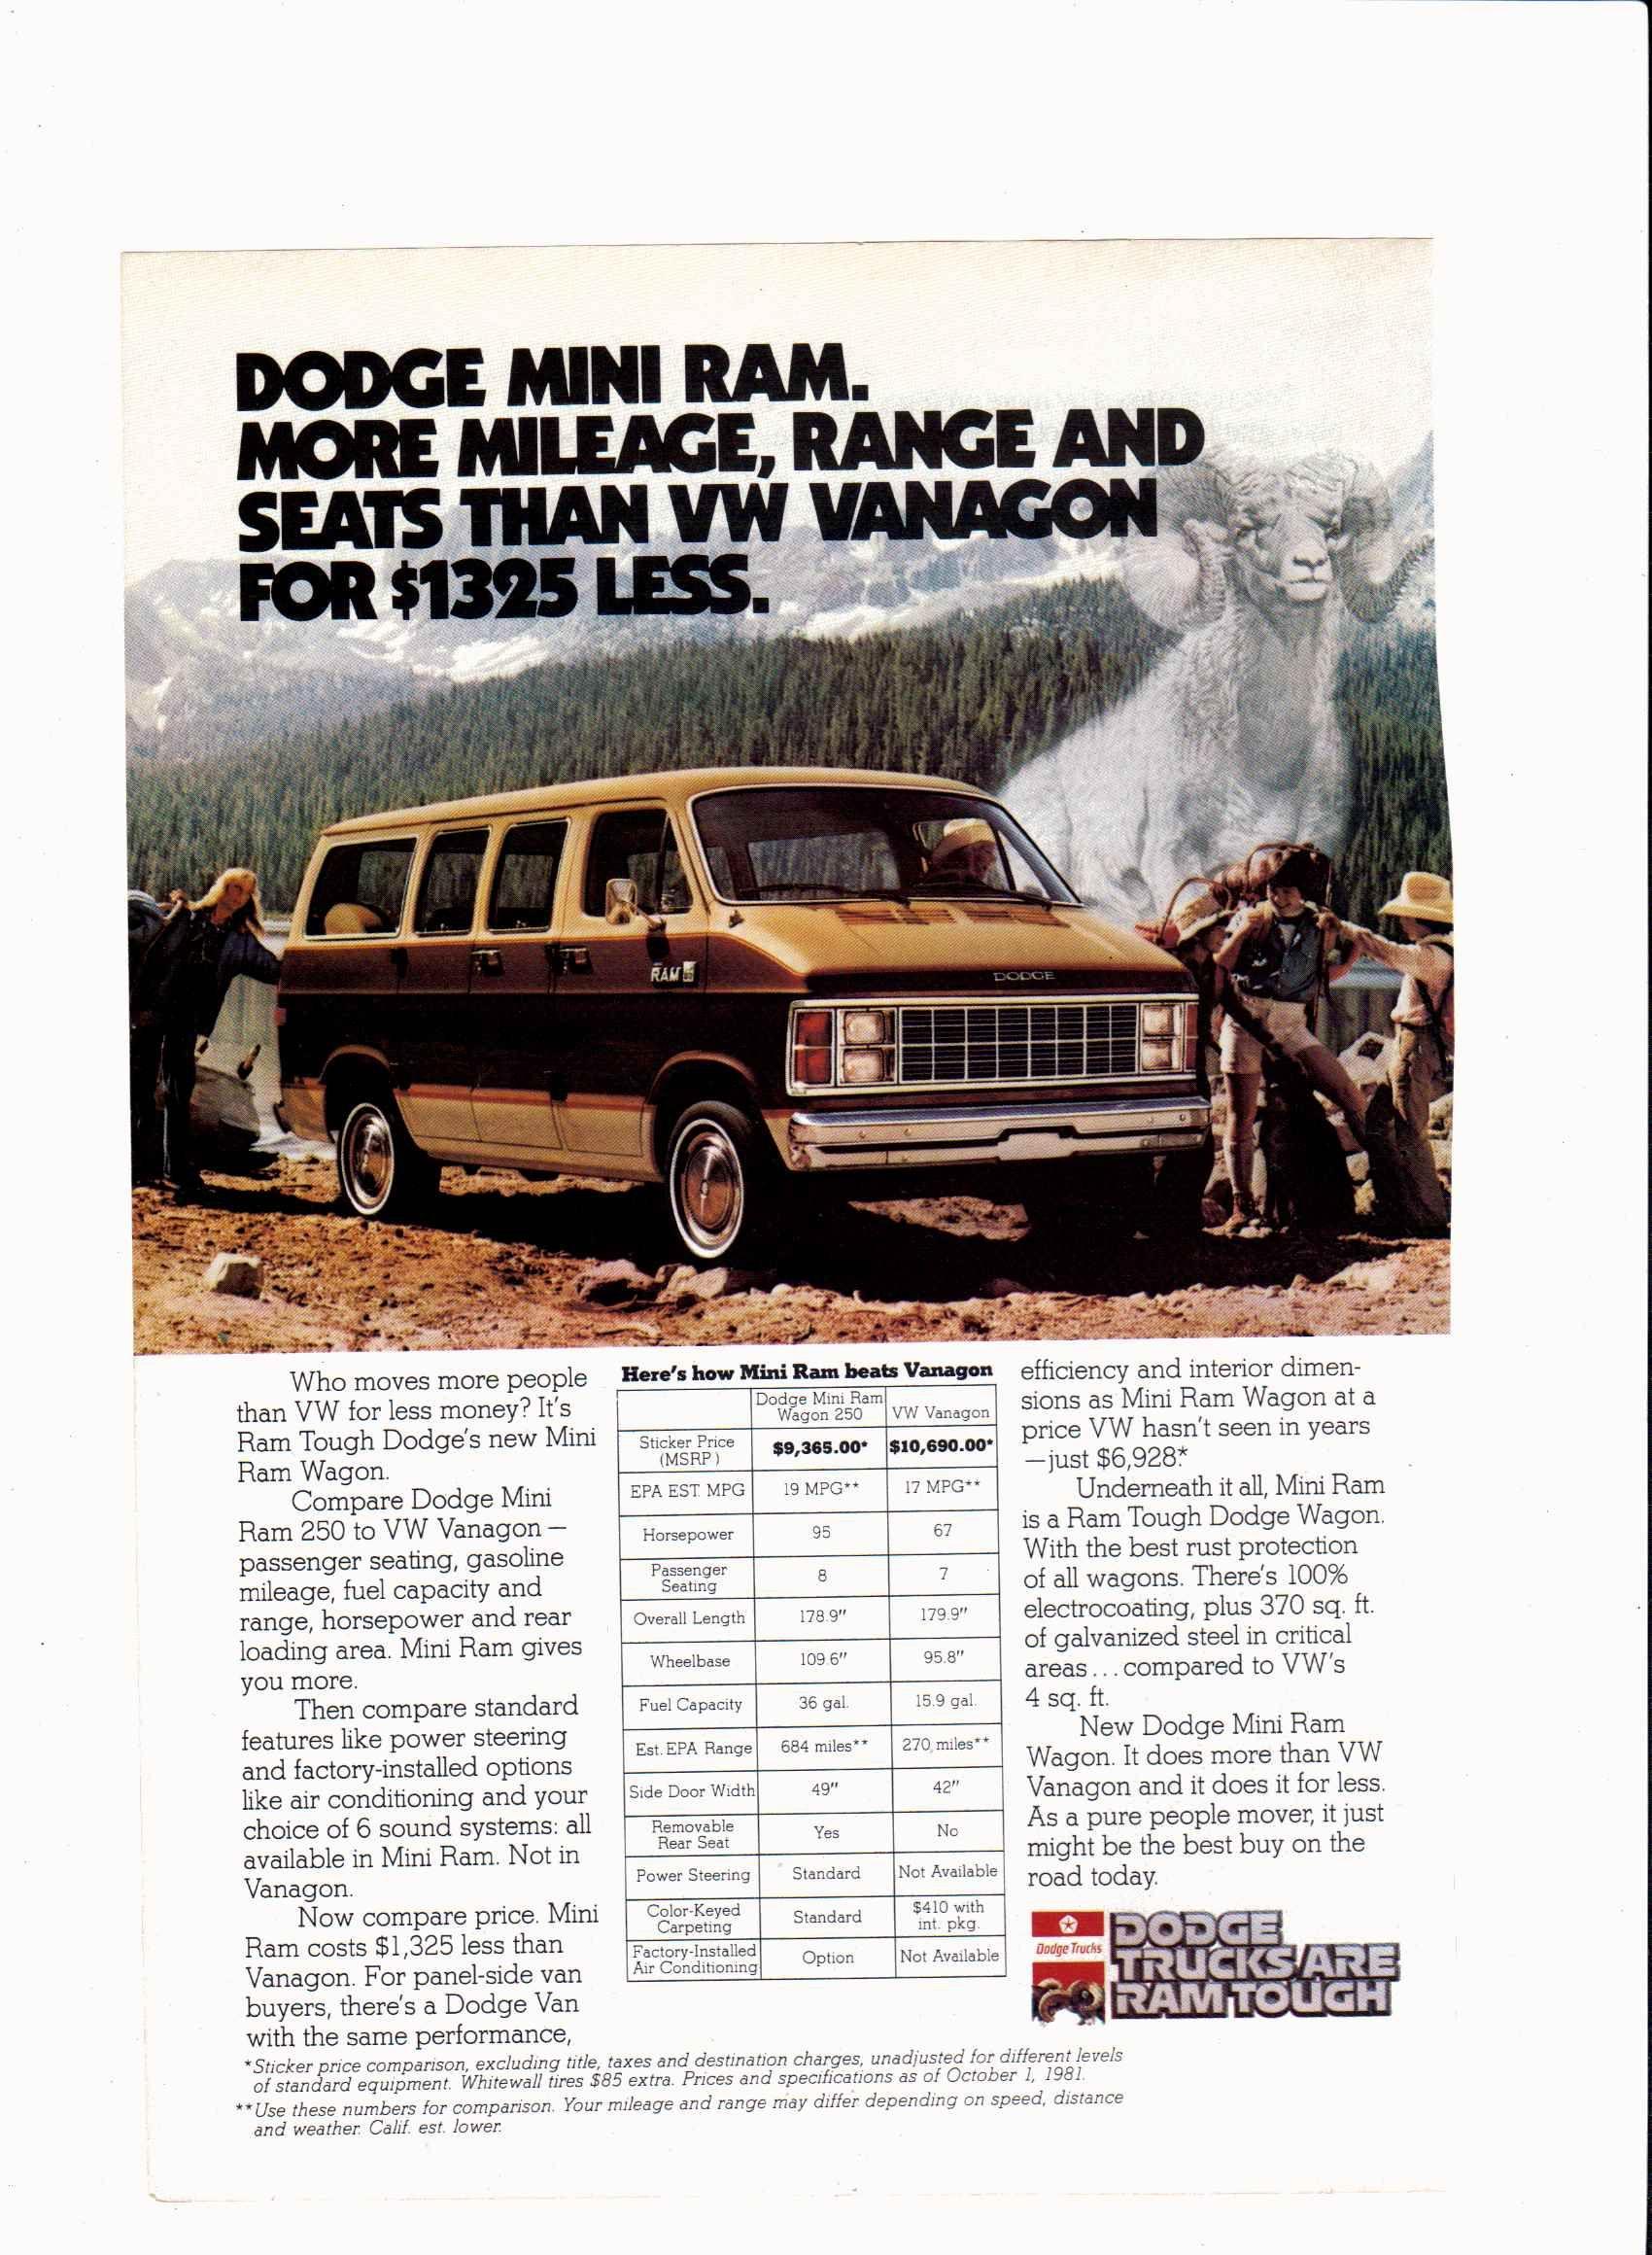 1982 Dodge Mini Ram Van ad National Geographic, December ...